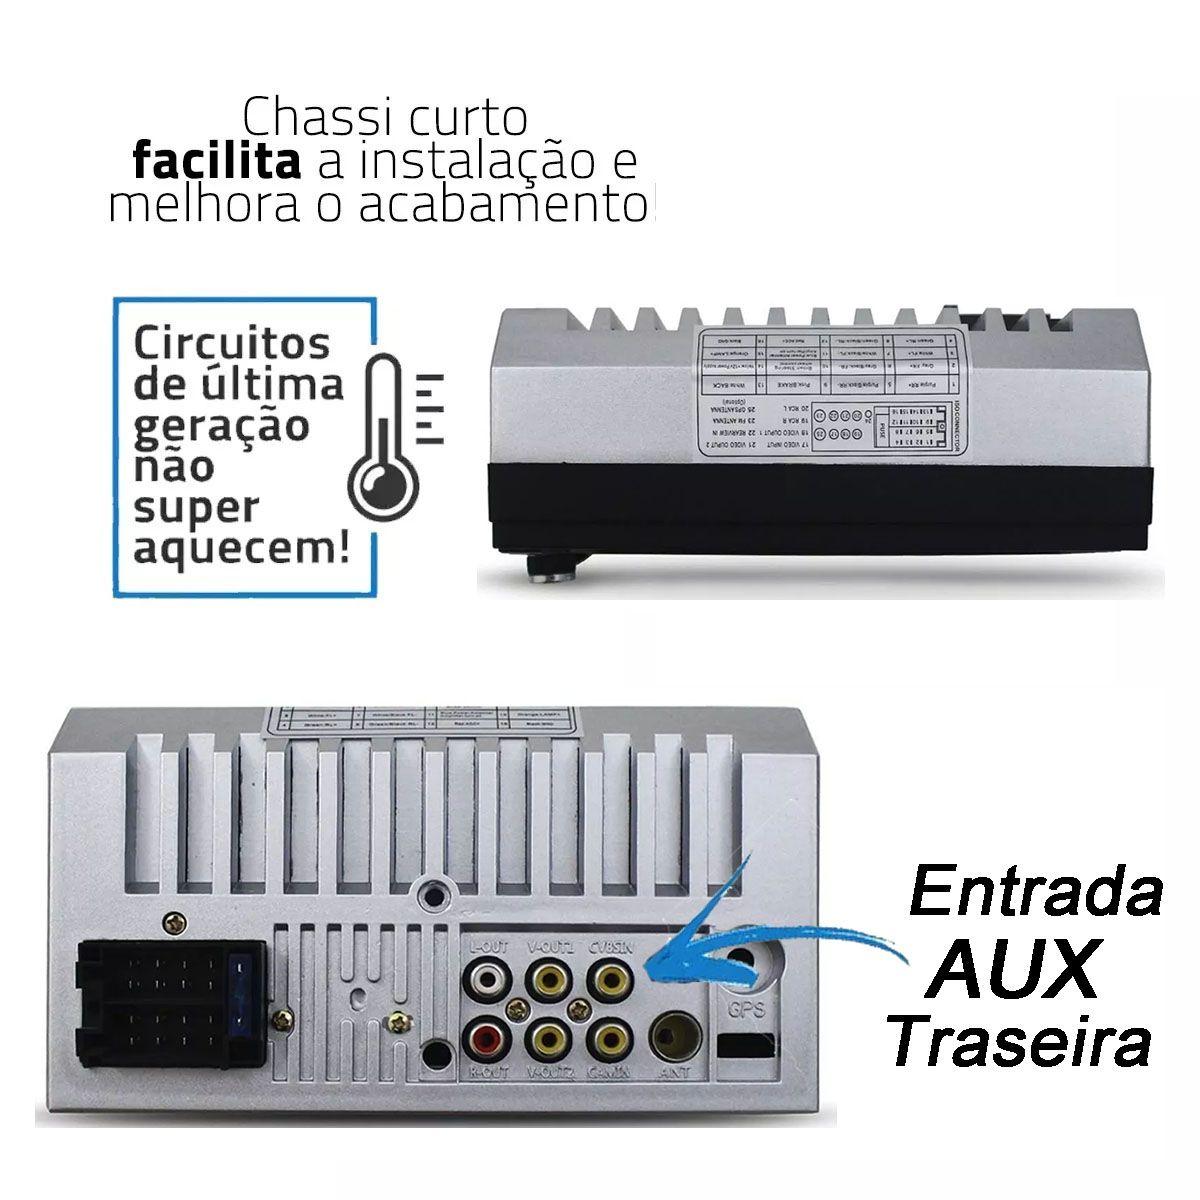 Central Multimídia Automotiva 7 Polegadas + Moldura Onix Cobalt Spin Prisma 2 Din Preta Chevrolet Gm